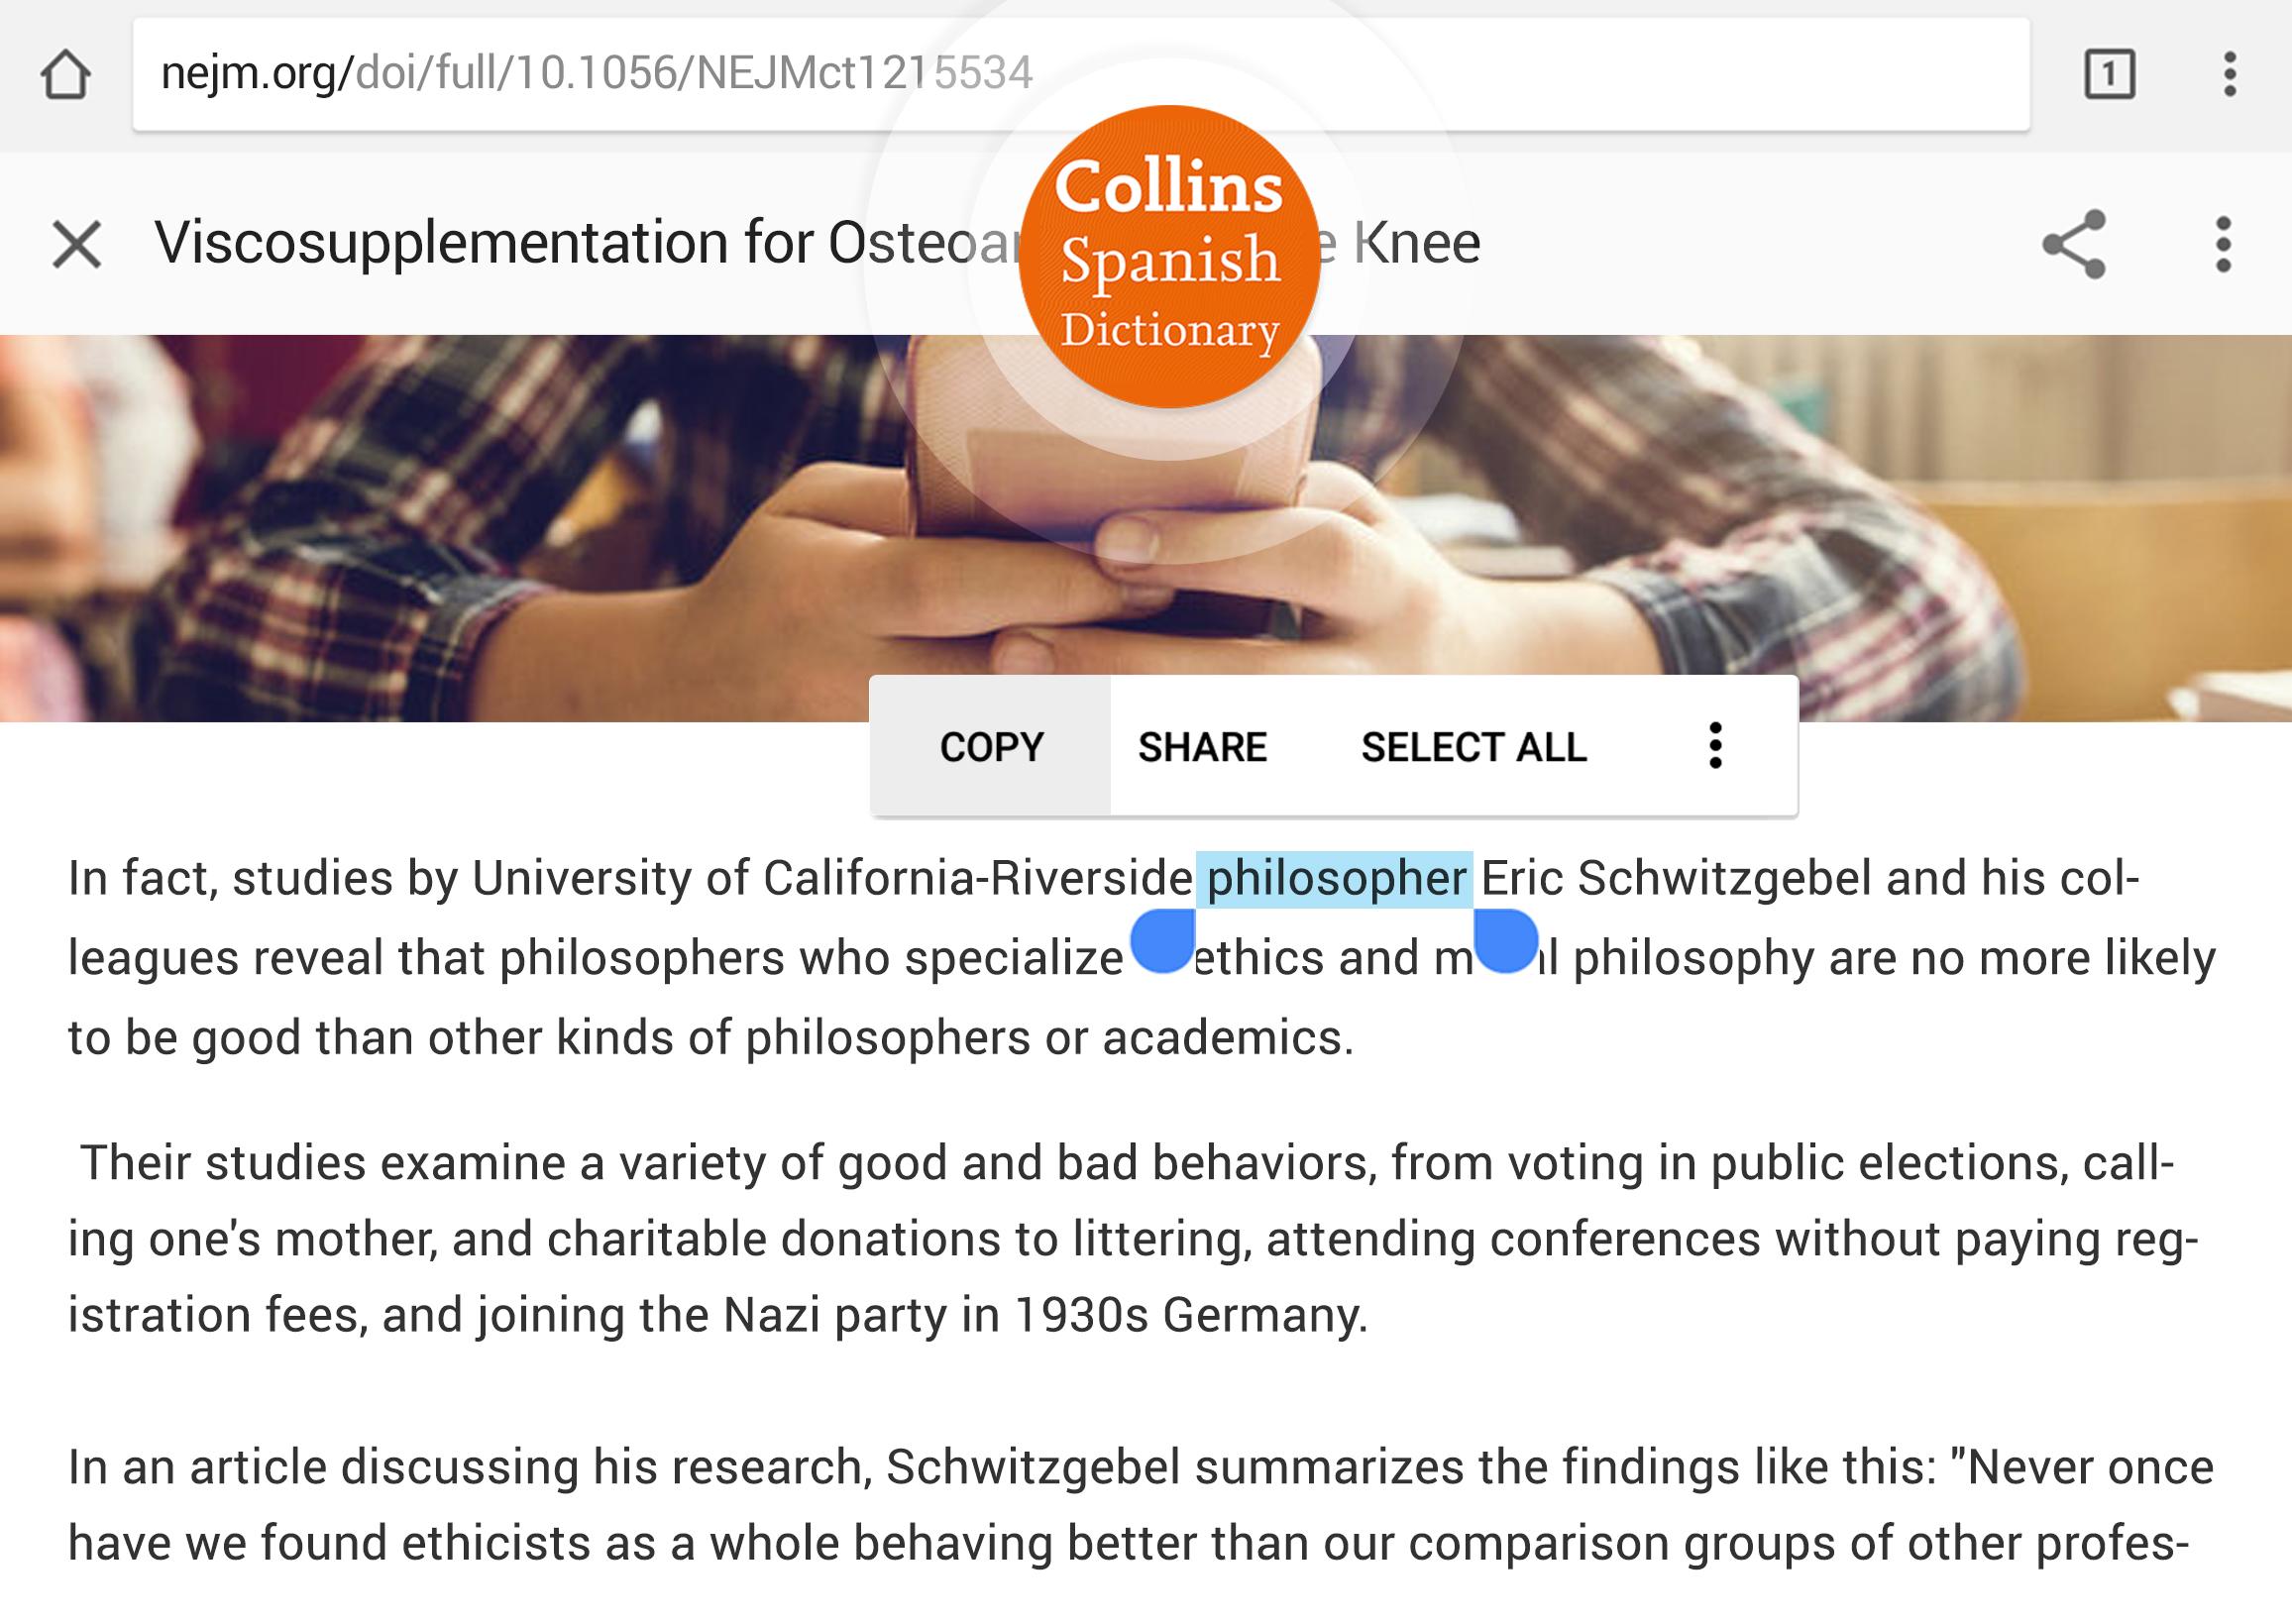 collins dictionary translator